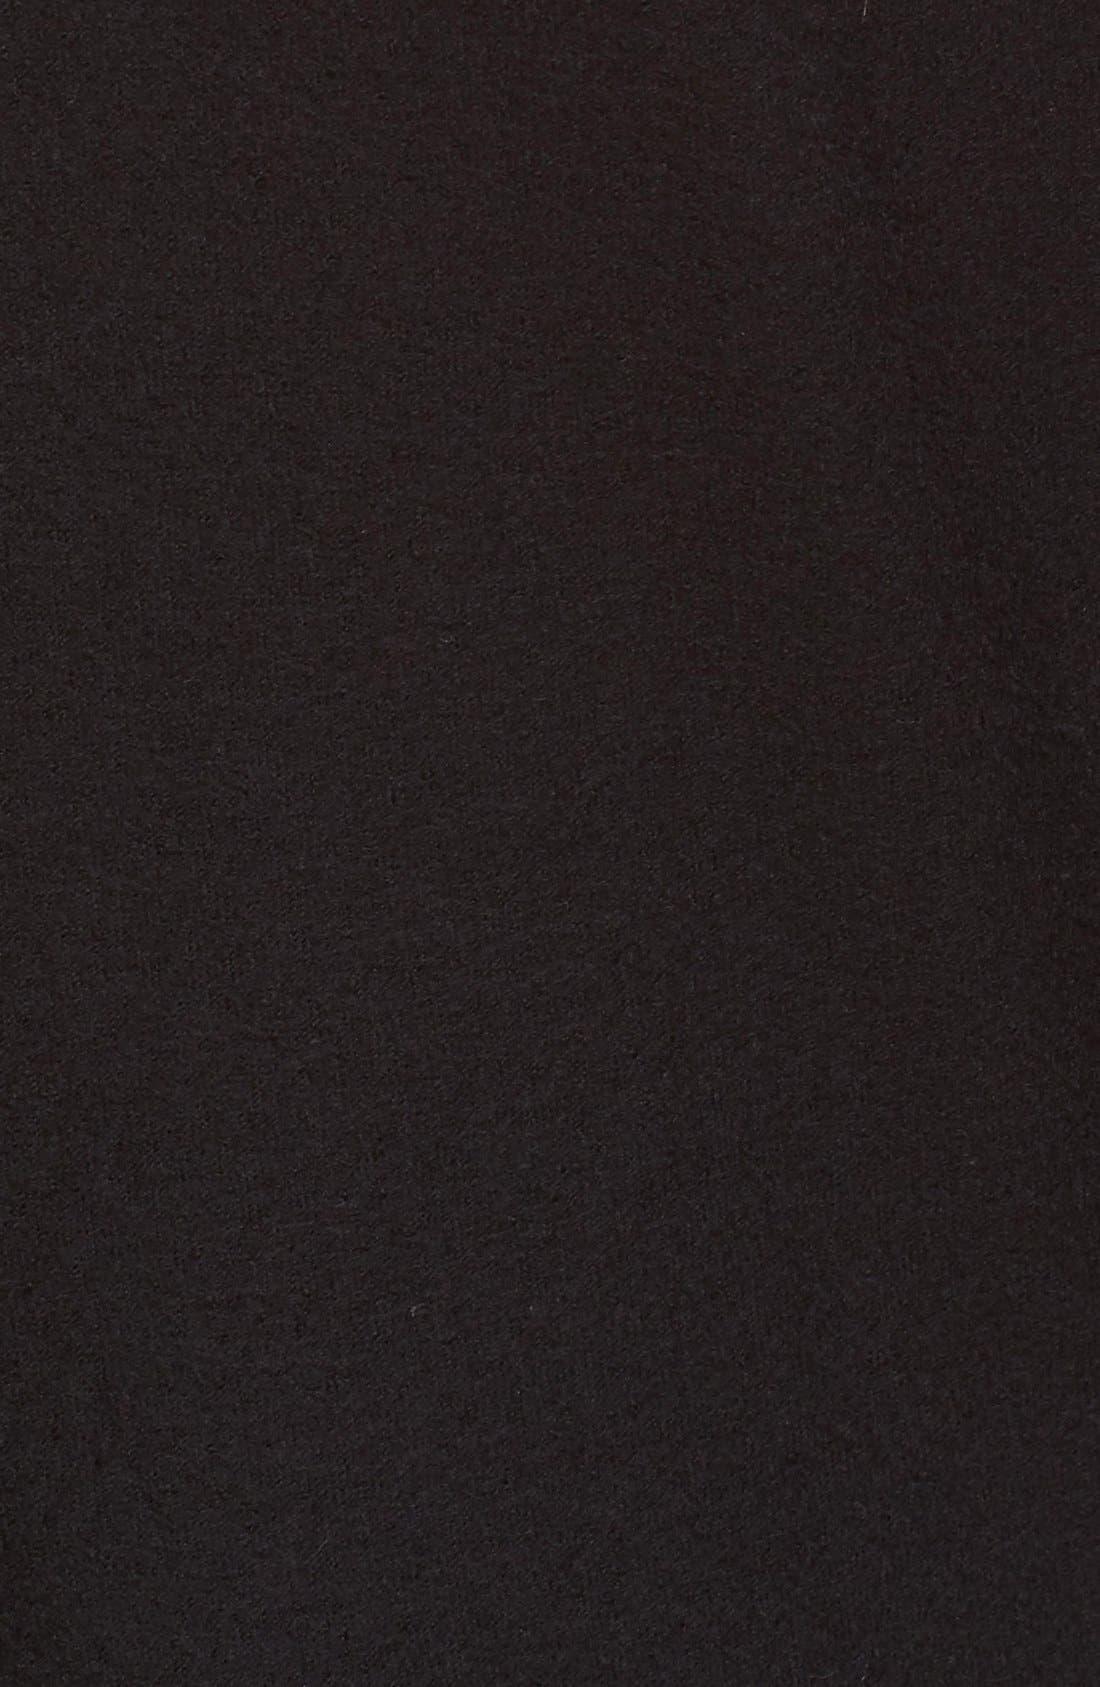 Club Wool Blazer,                             Alternate thumbnail 5, color,                             Black